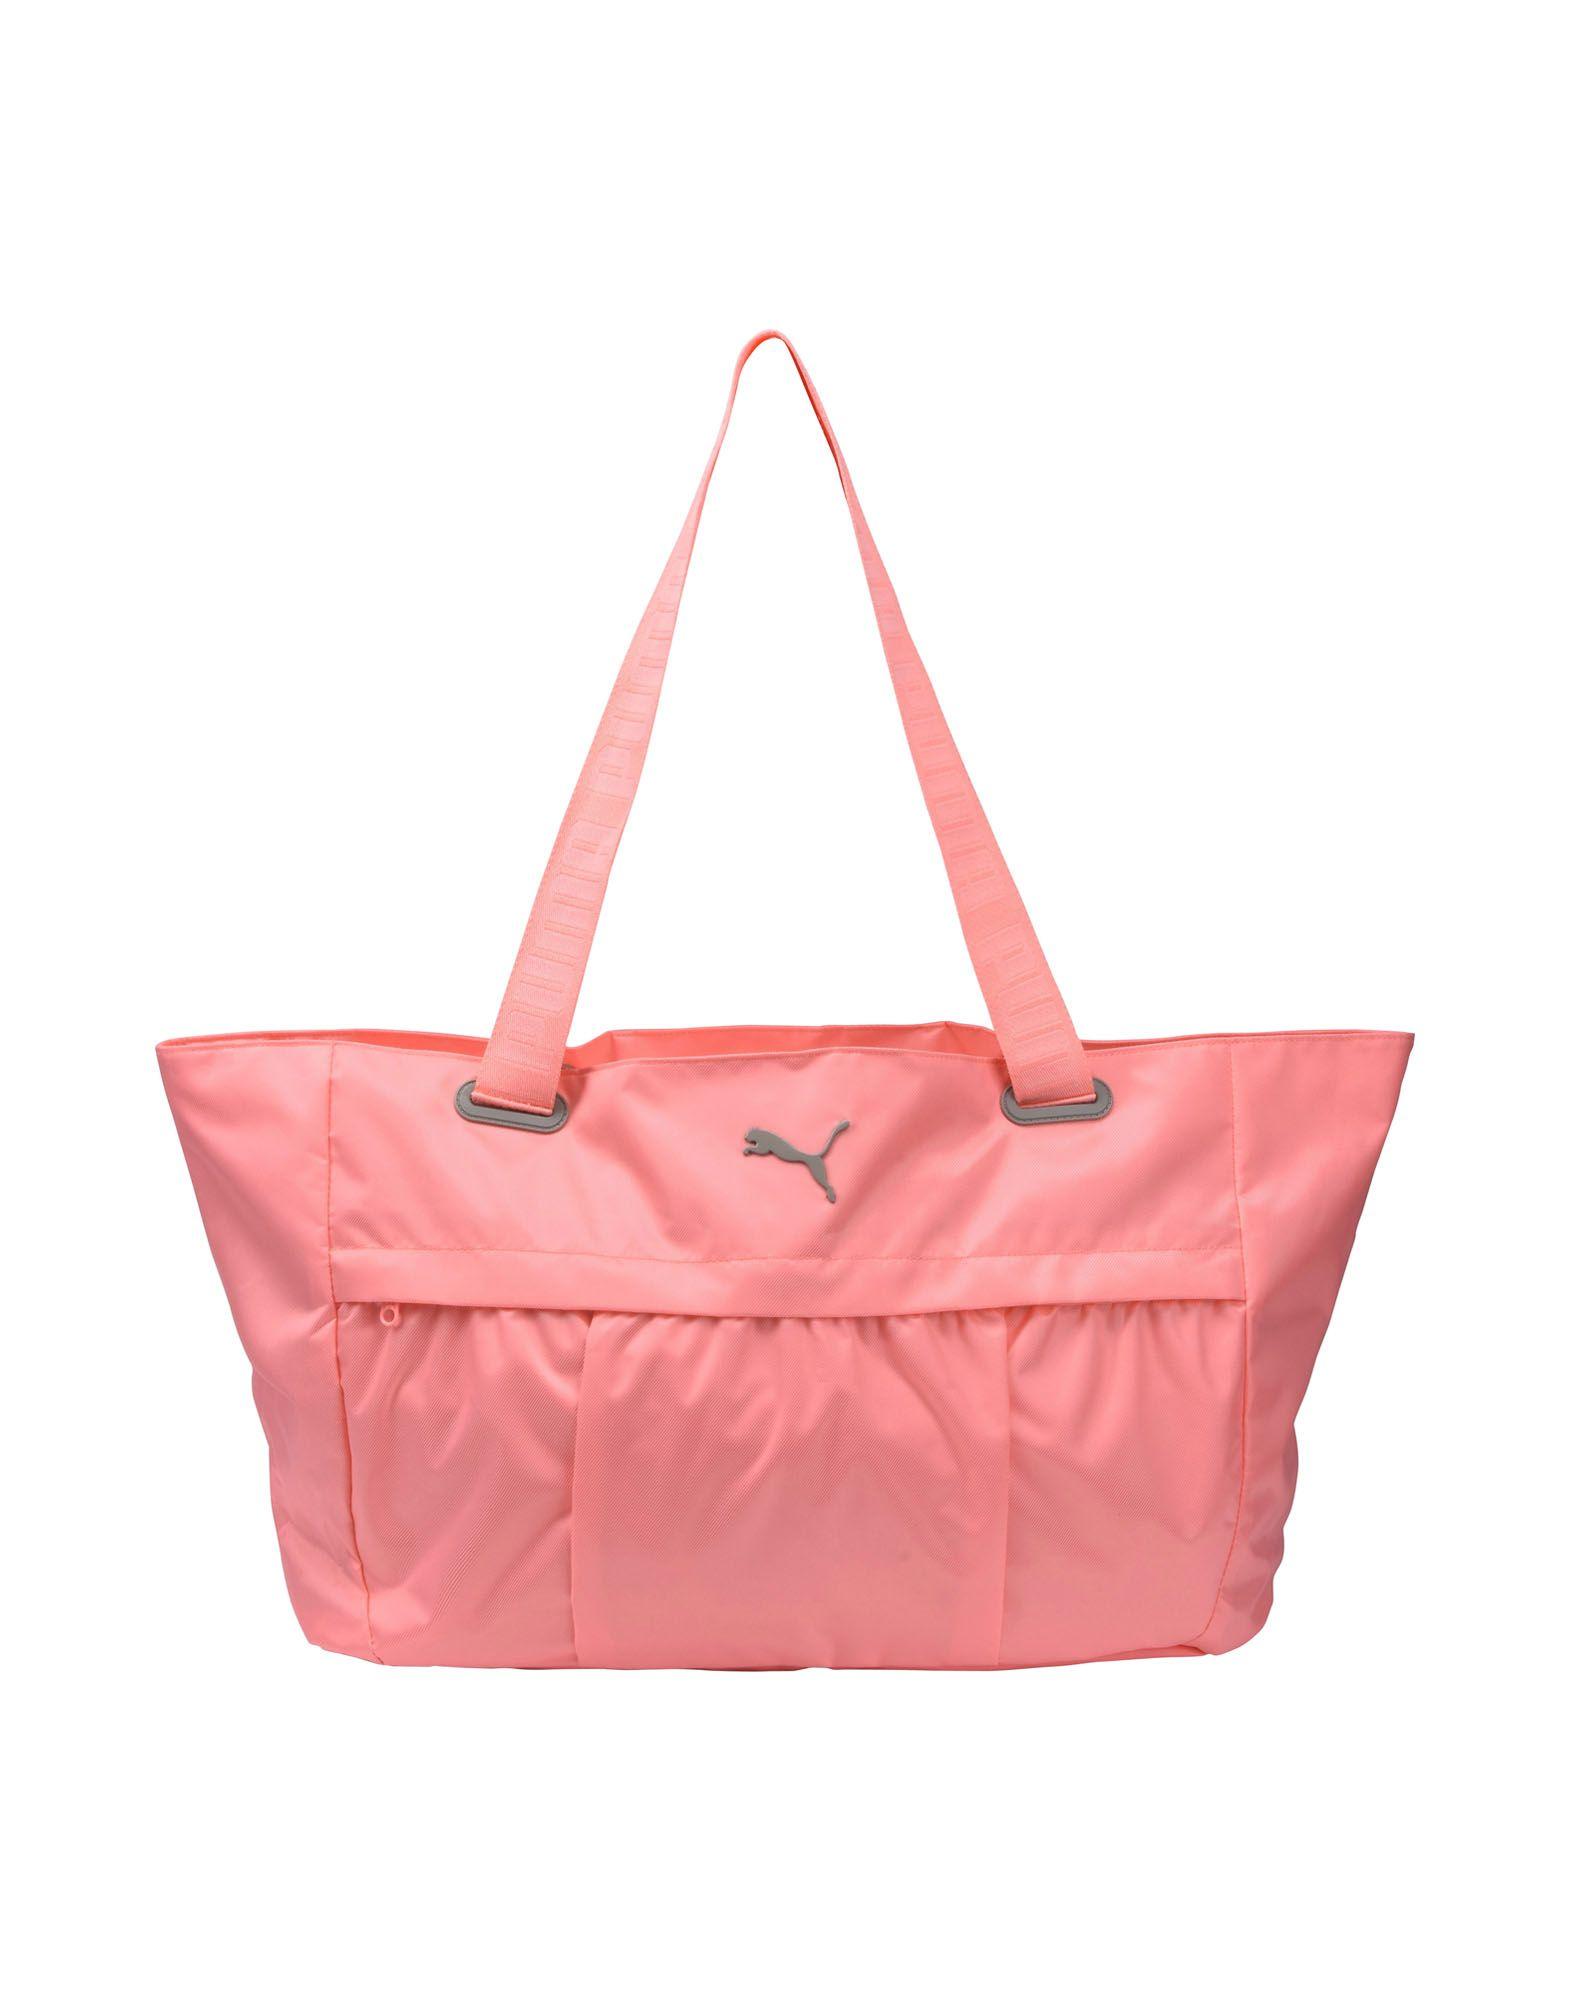 PUMA Дорожная сумка сумка 3326 2014 puma